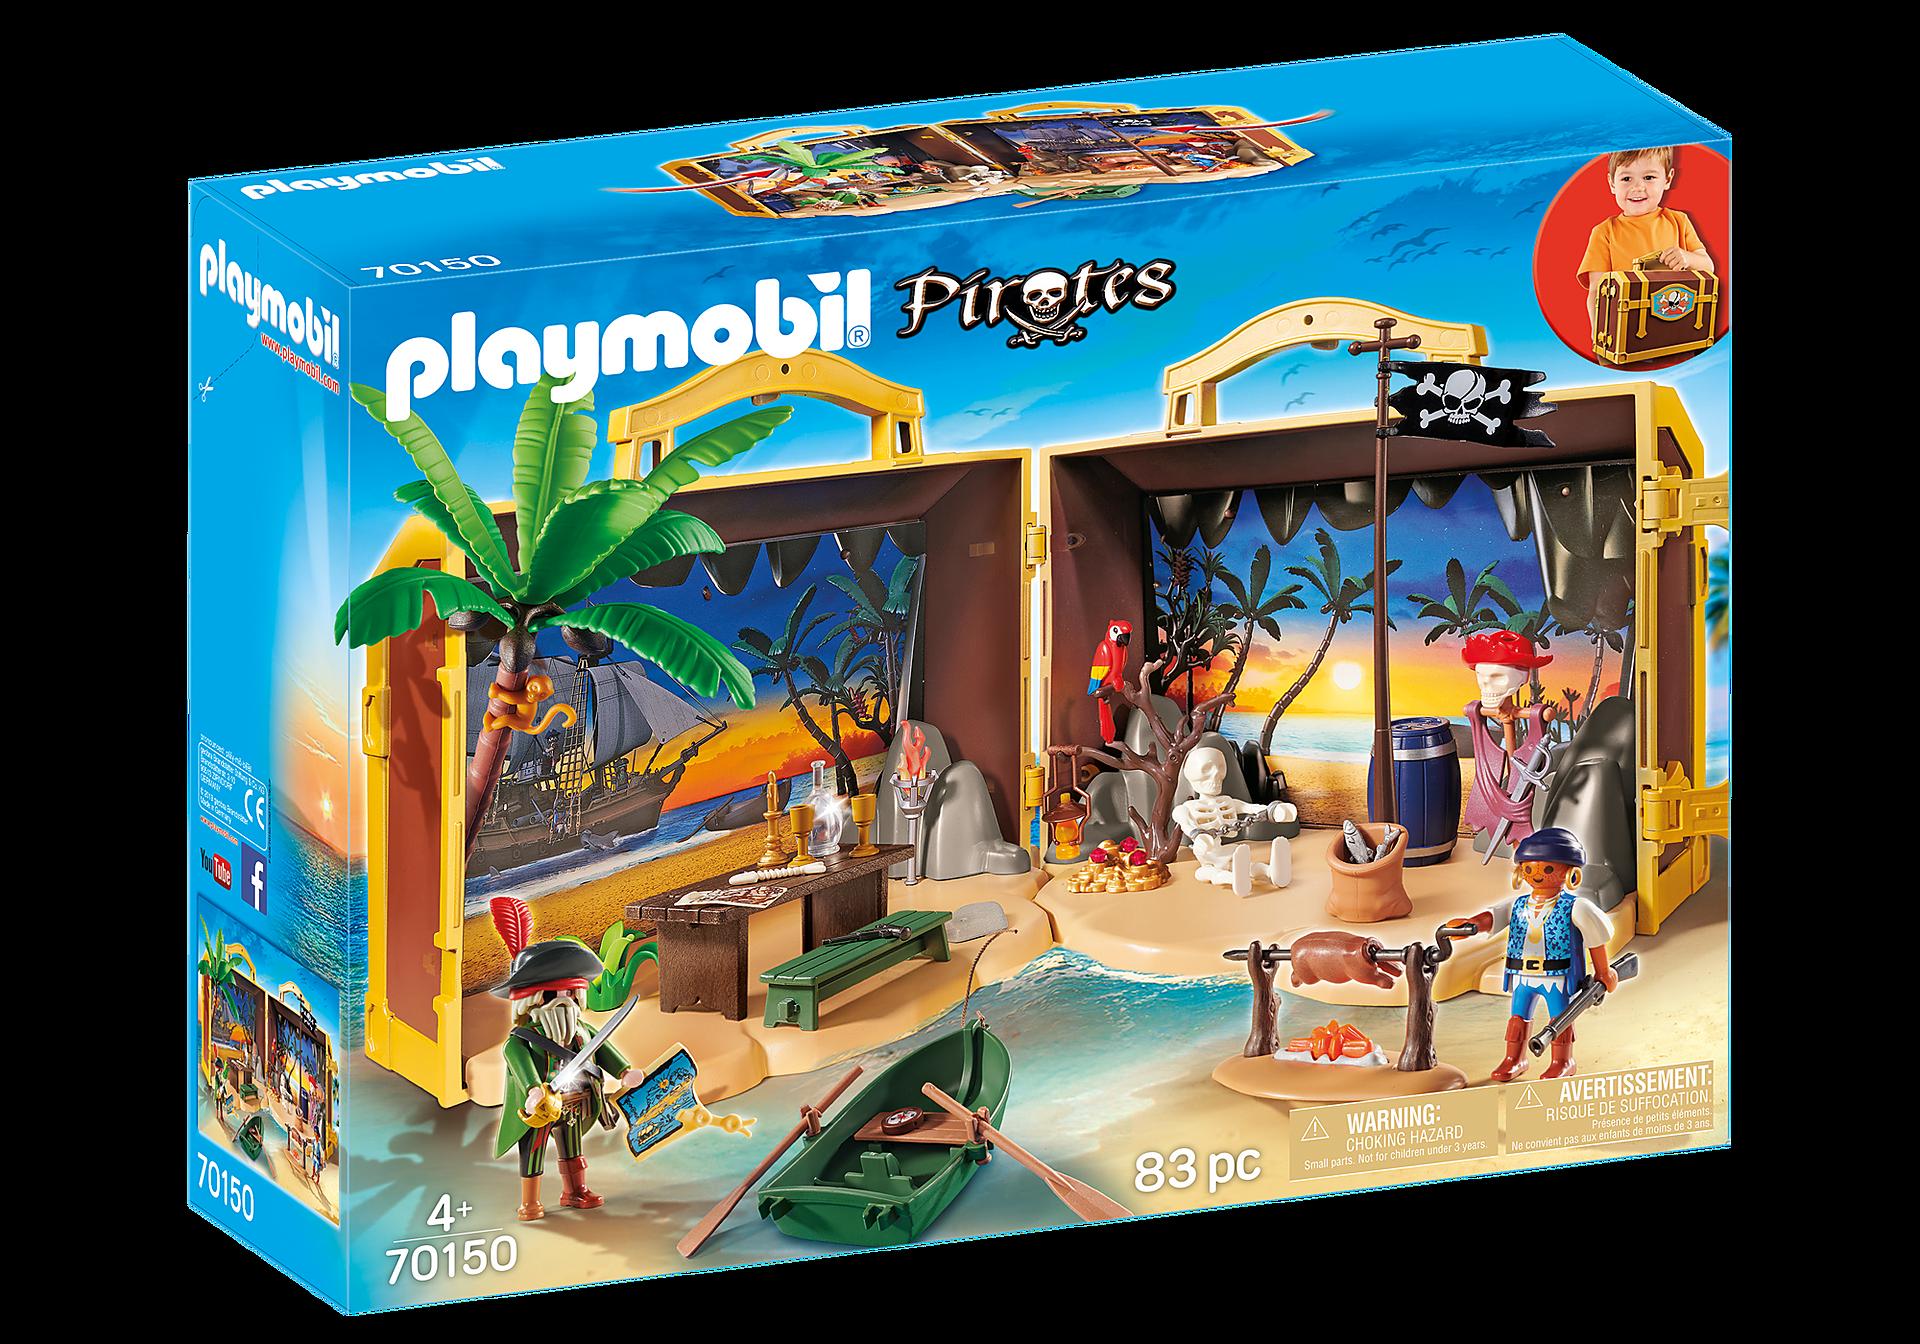 Playmobil - Take Along Pirate Island (70150)